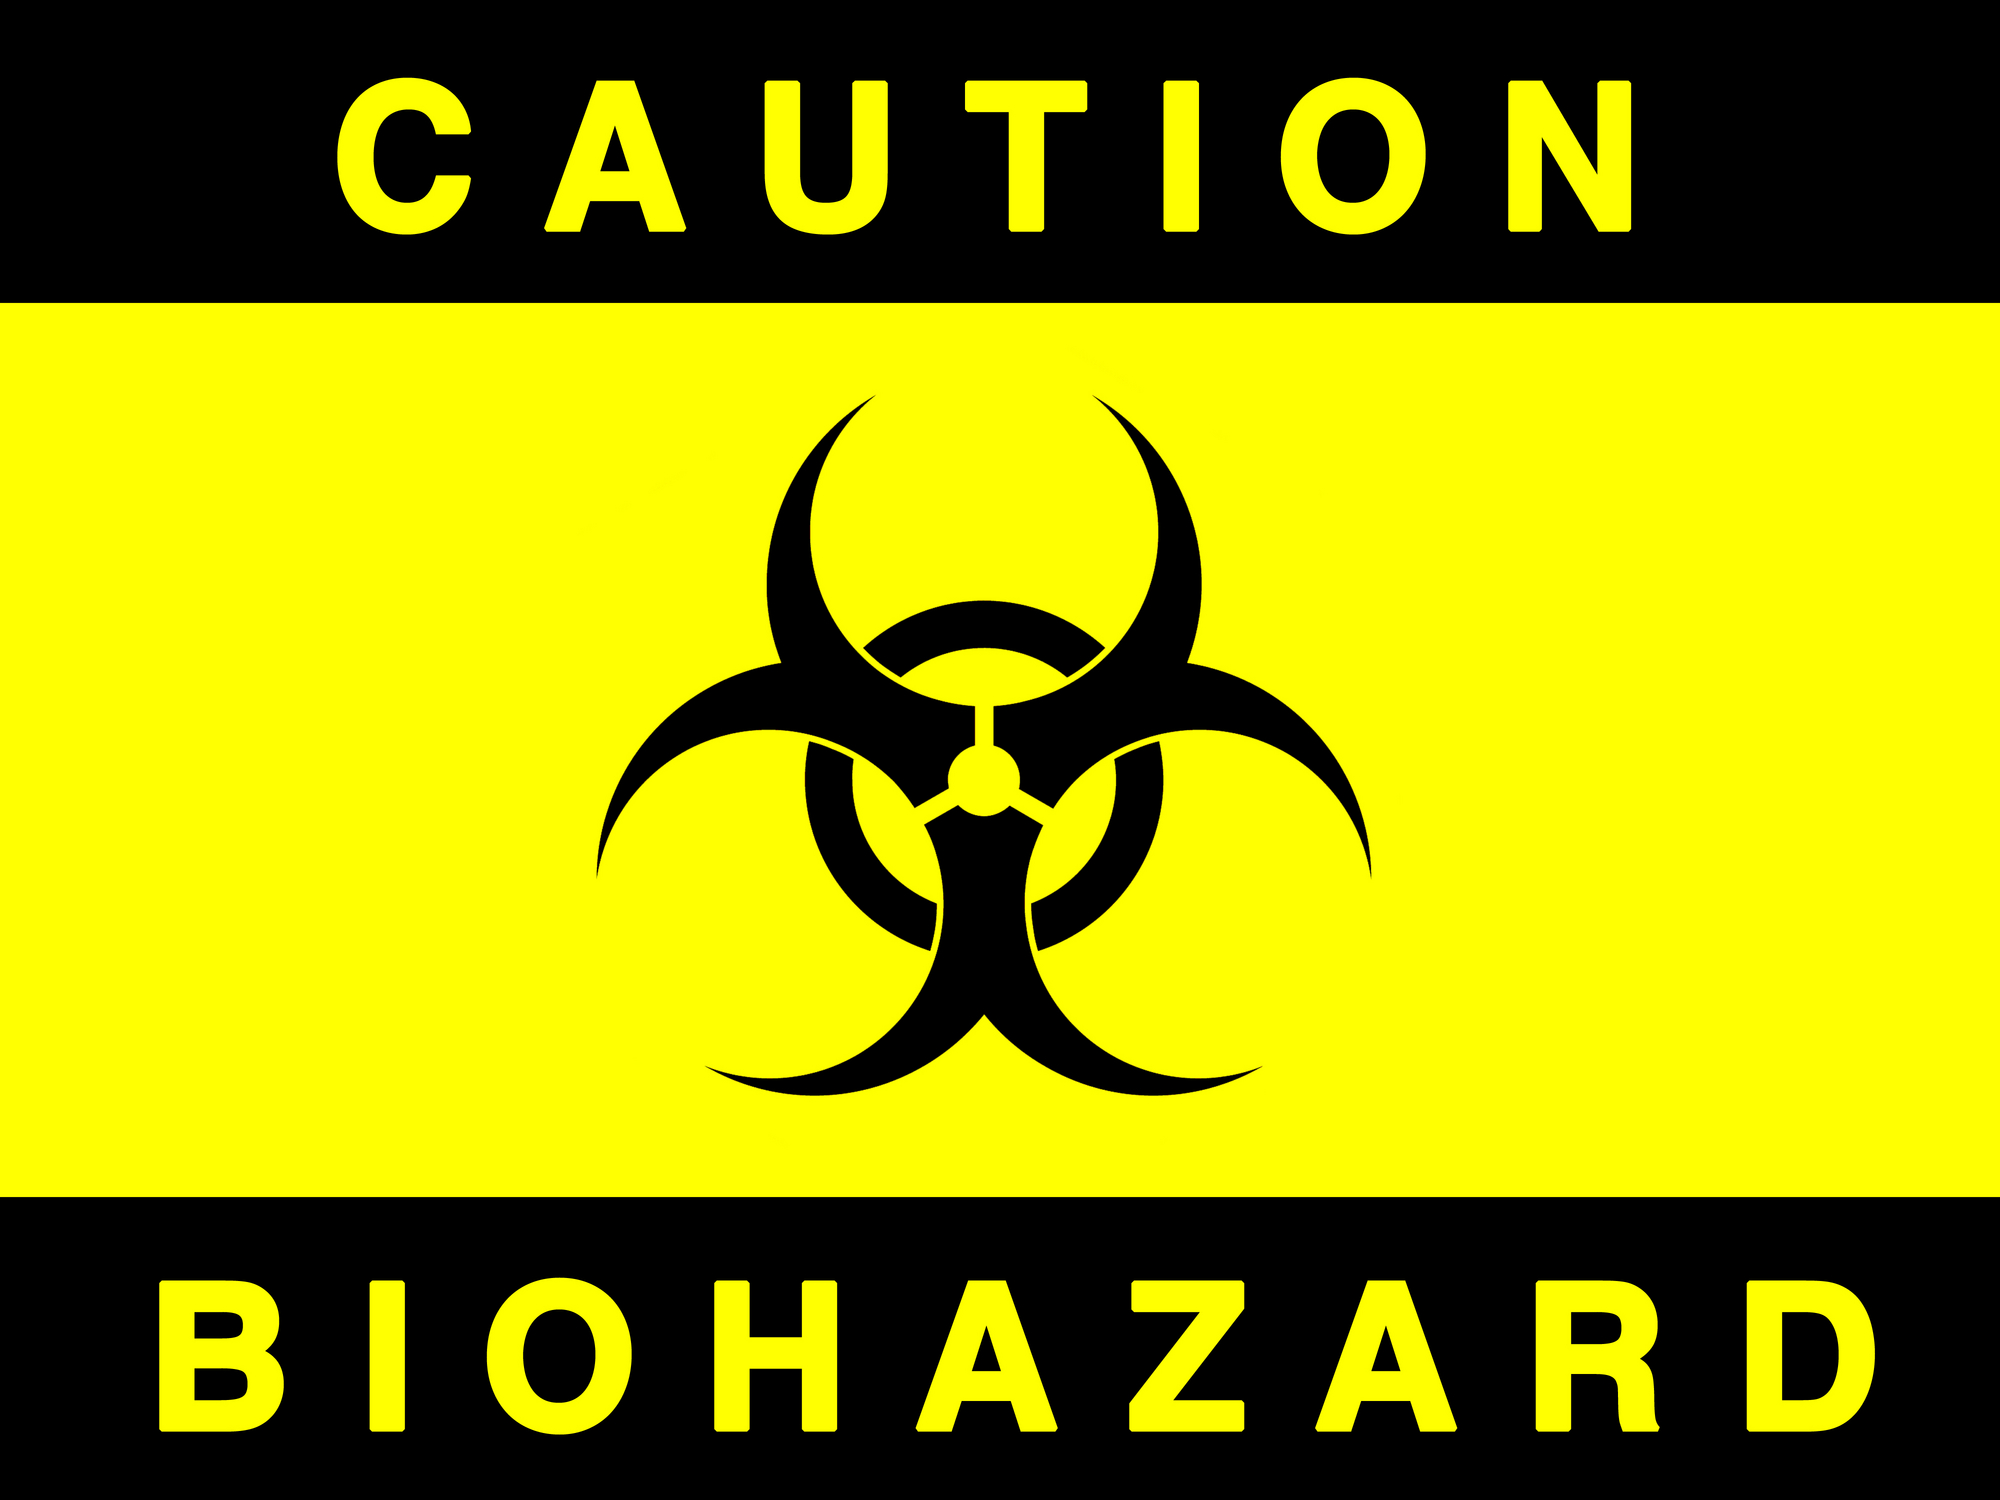 Biohazard Symbol 2000x1500